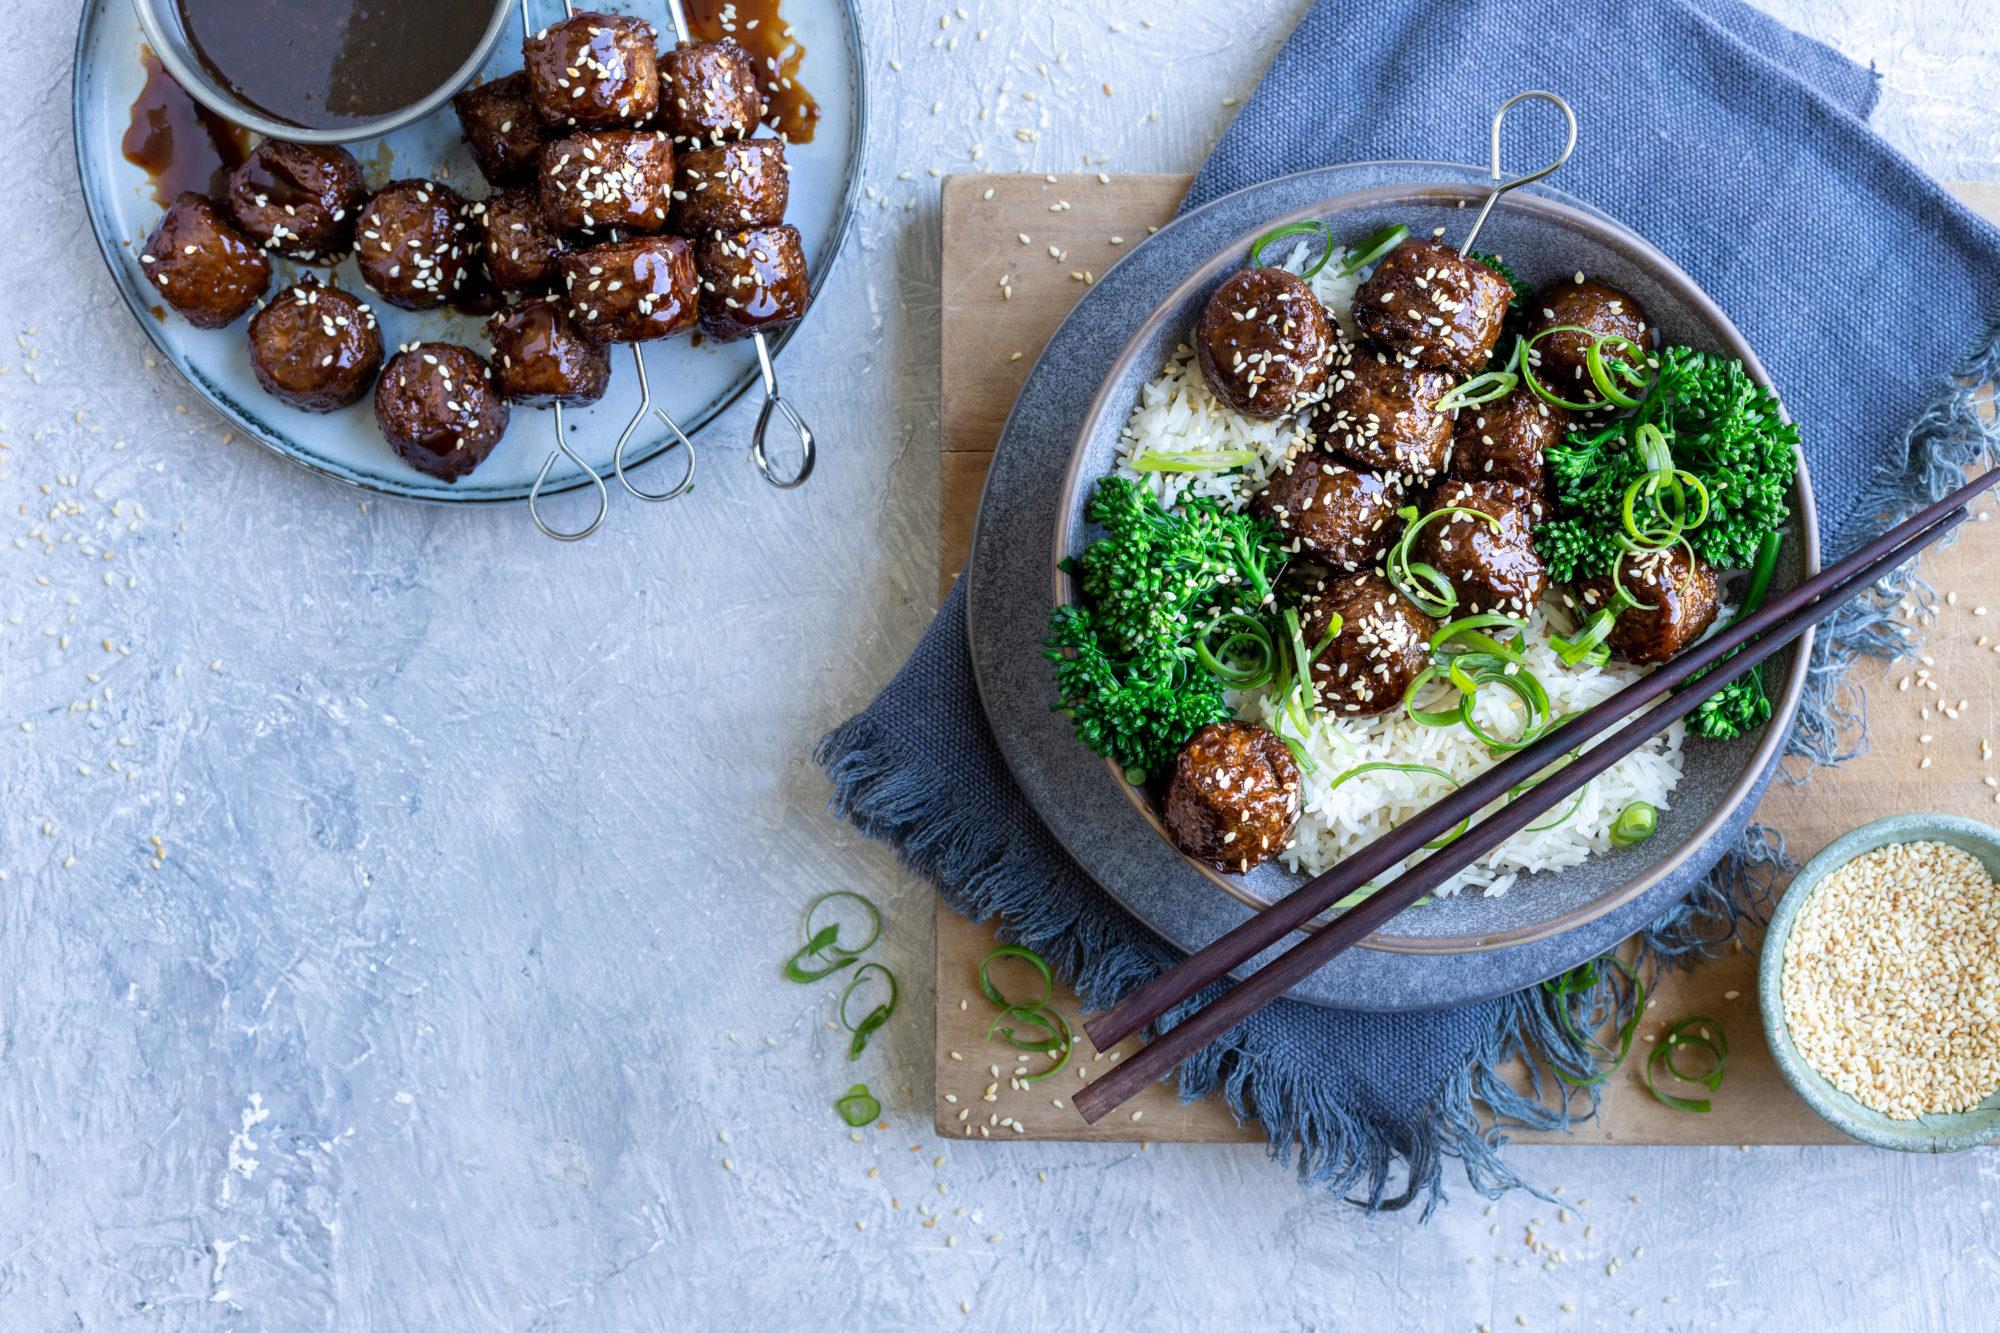 Fry's Mongolian Meatballs